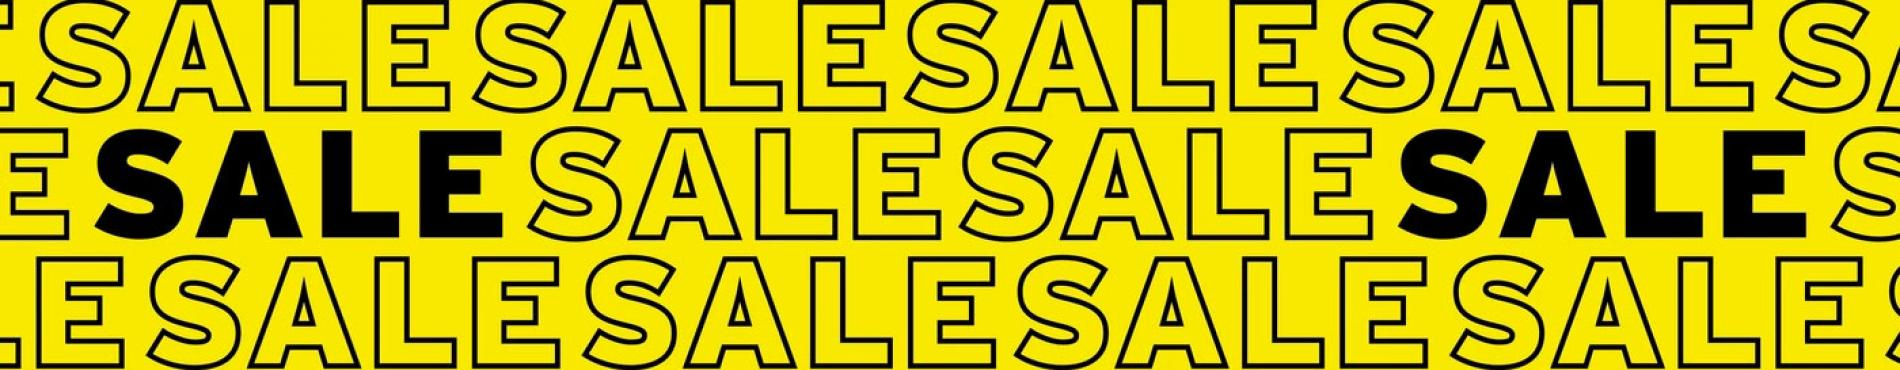 🤵 САМЫЙ БОЛЬШОЙ ВЫБОР ПРОДУКТОВ В МАРКЕТЕ MQL5 С РАЗЛИЧНЫМИ ПРИНЦИПАМИ РАБОТЫ: https://www.mql5.com/ru/users/moneystrategy/seller#products  🤵 THE LARGEST SELECTION OF PRODUCTS IN THE MQL5 MARKET WITH VARIOUS PRINCIPLES OF WORKING: https://www.mql5.com/en/users/moneystrategy/seller#products  IT'S GOOD. THAT IS GOOD 👍